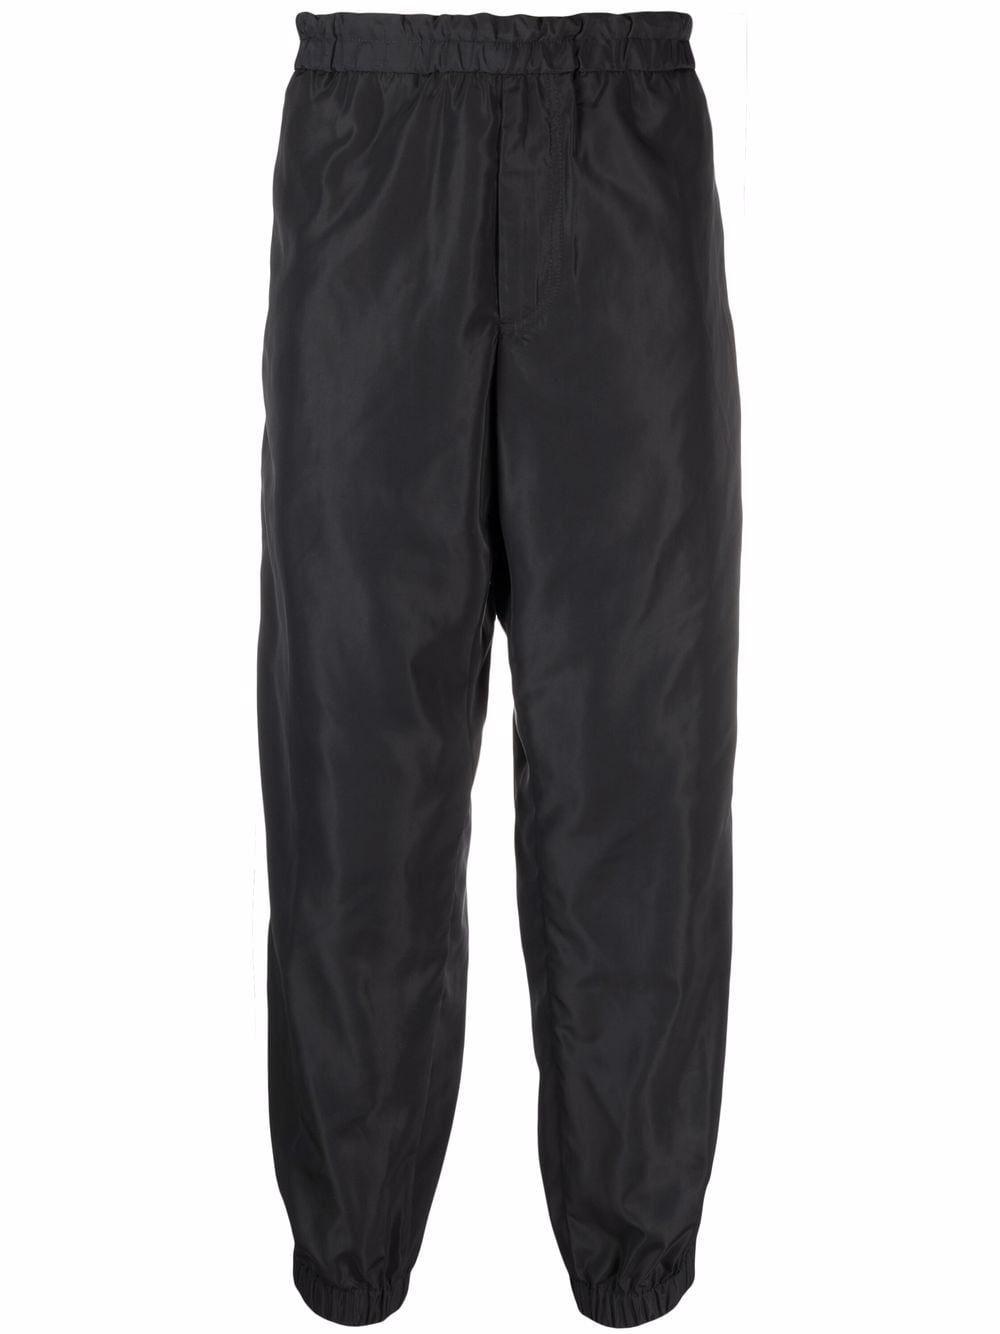 Pantalone jogging con banda